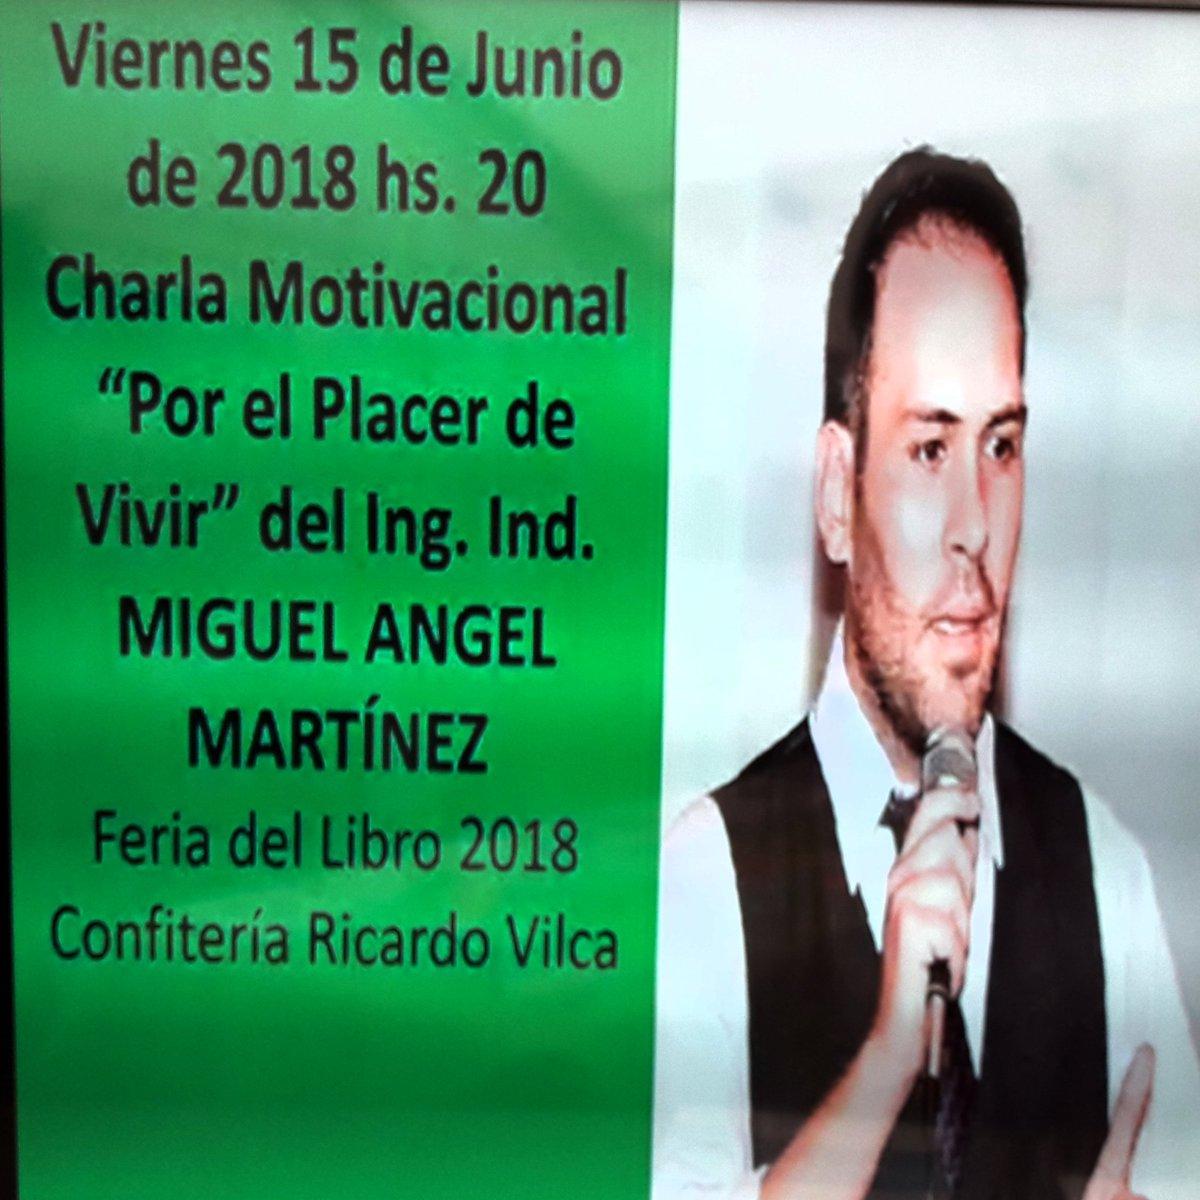 Abjujuy On Twitter Hoy Los Esperamos A Hs 20 00 Charla